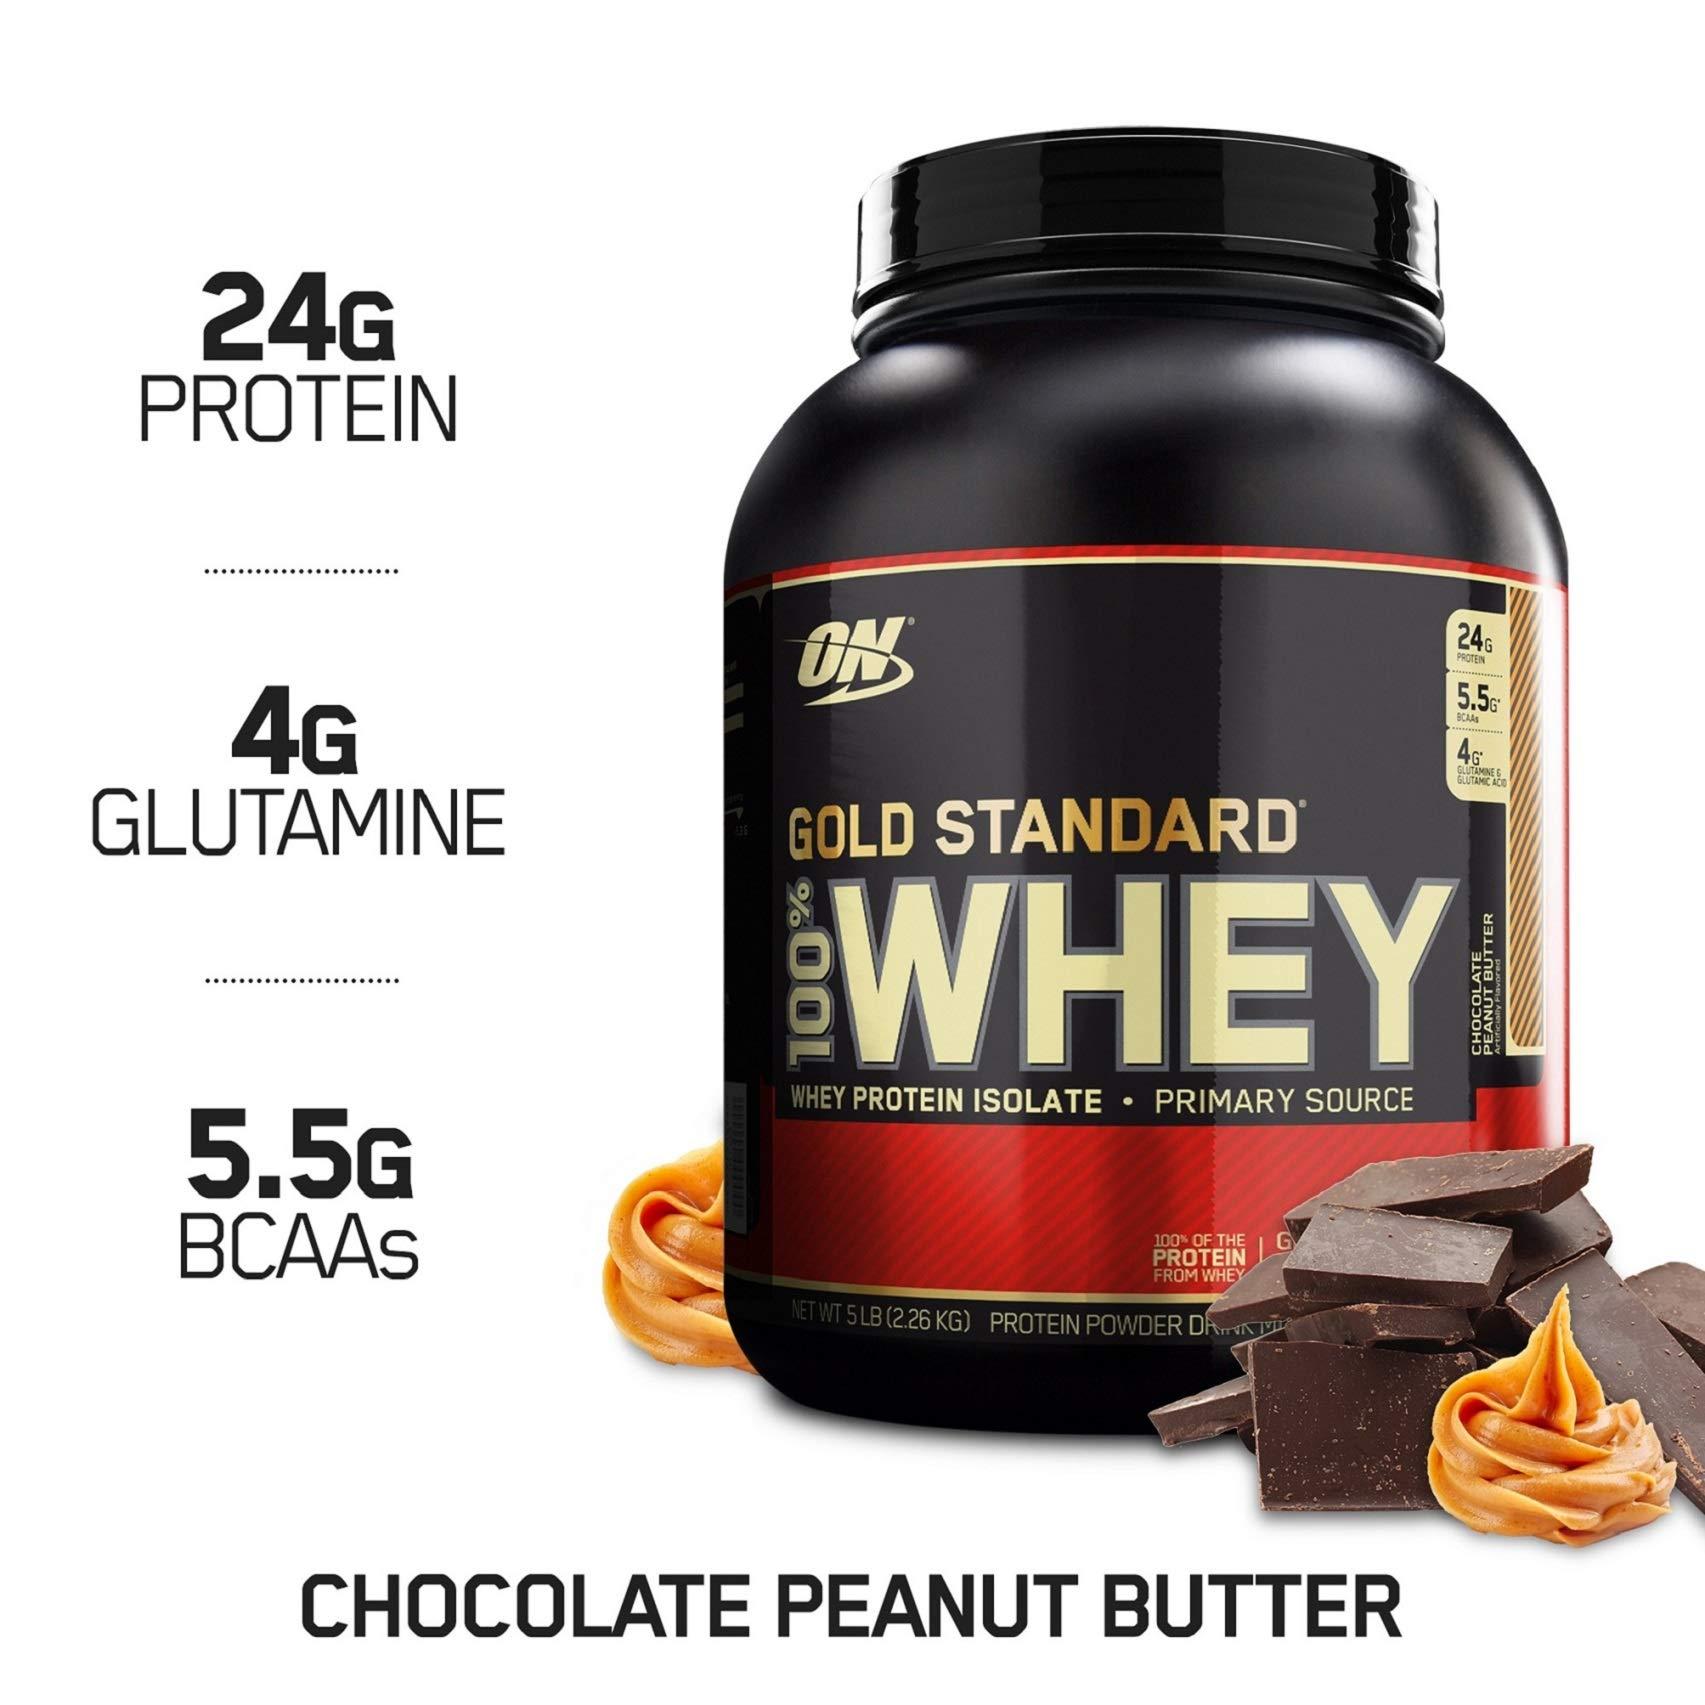 Optimum Nutrition Gold Standard 100% Whey Protein Powder, Chocolate Peanut Butter, 5 Pound by Optimum Nutrition